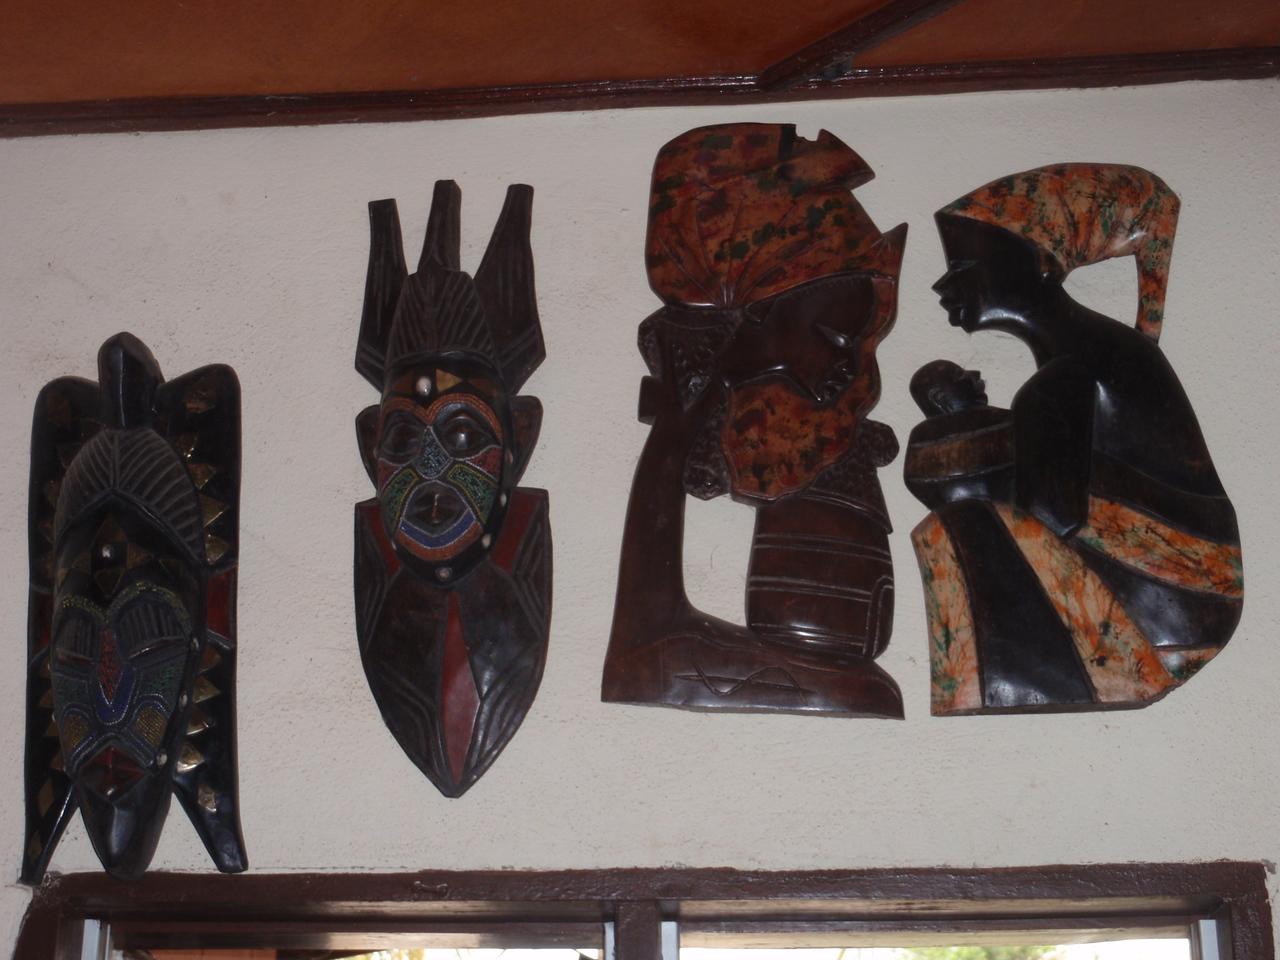 158_Cotonou  The Craft Market  Woodcarvings  Masks